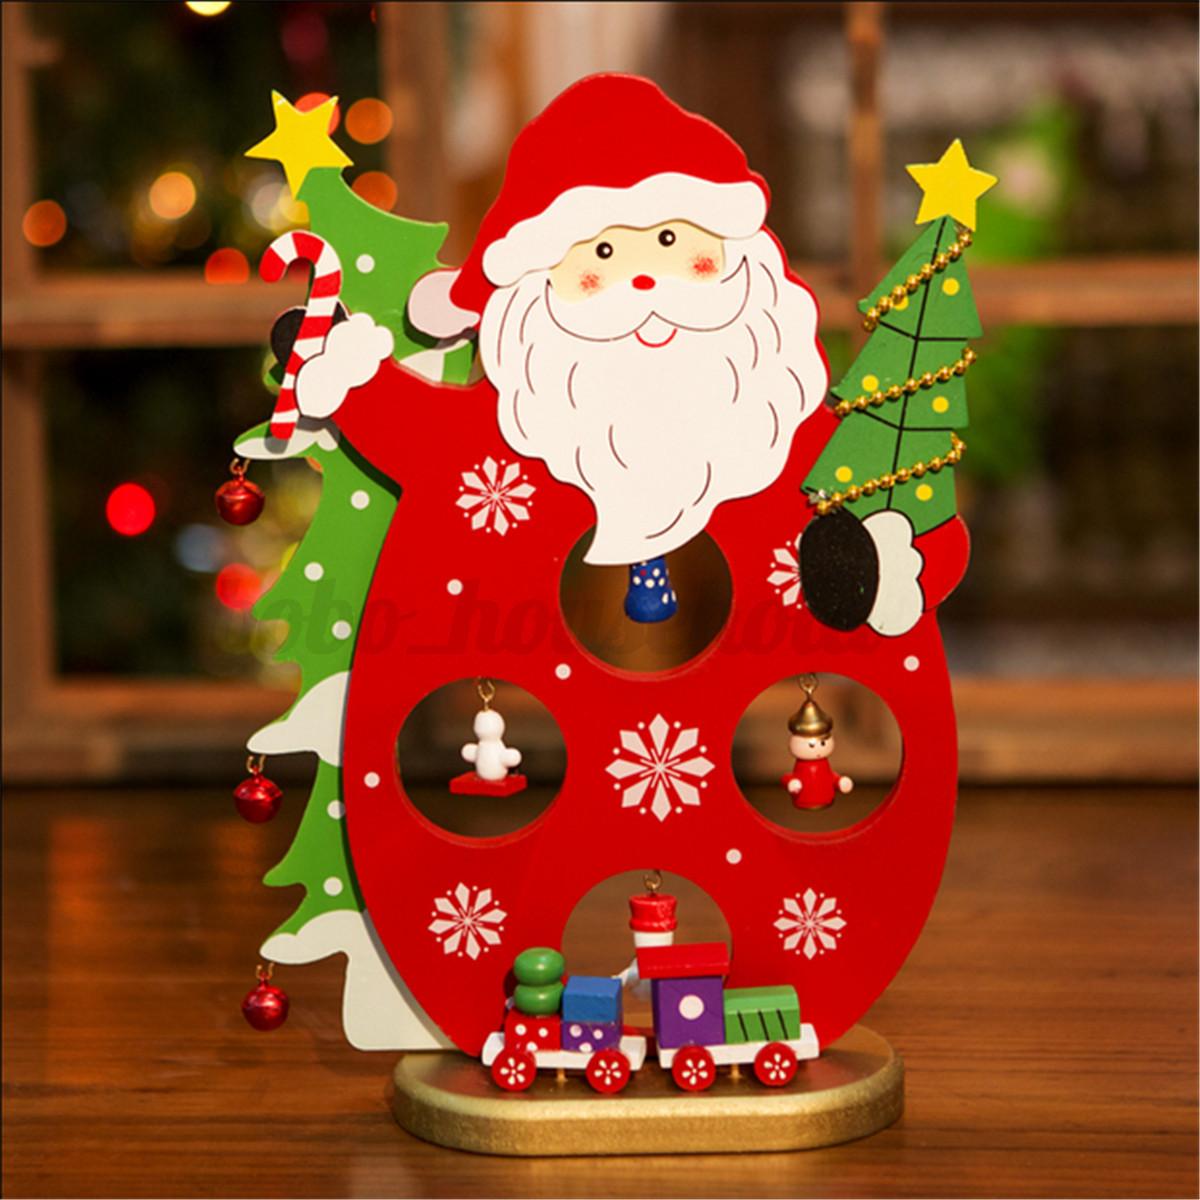 Santa snowman wooden christmas tree ornaments desk table